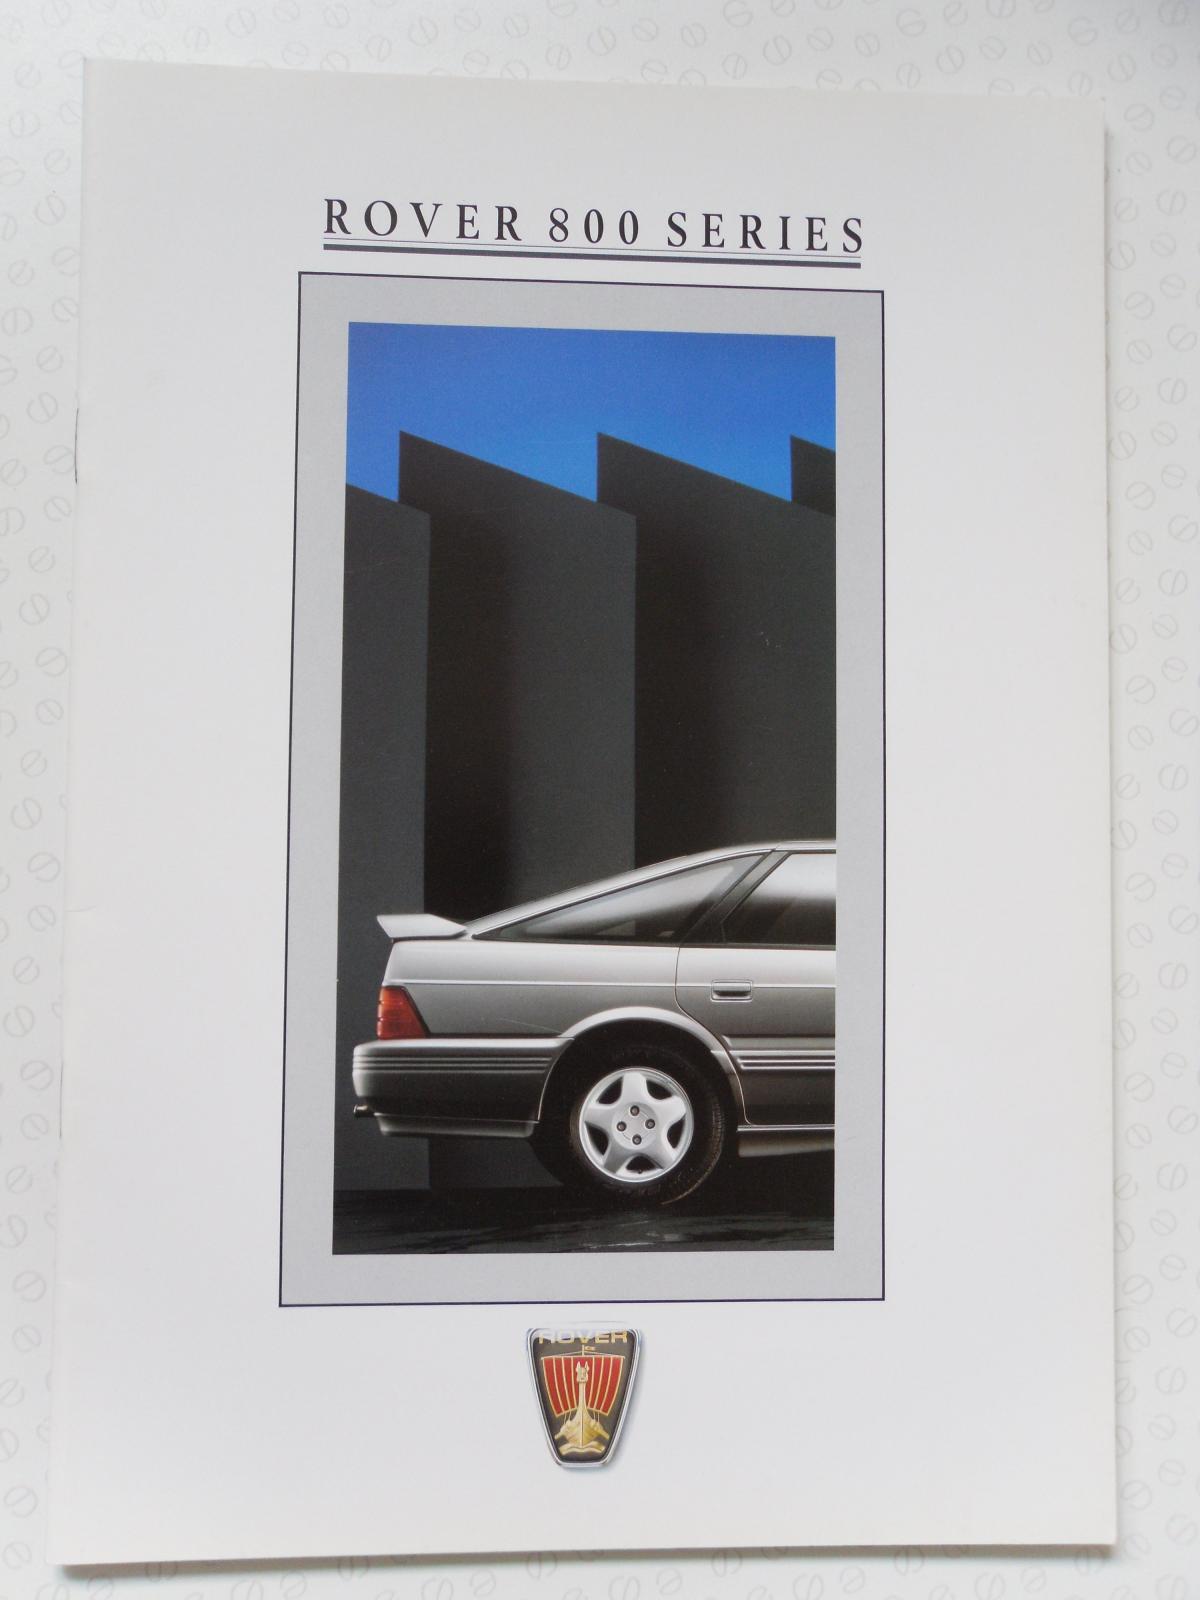 Rover 800 Sherpa 001.JPG